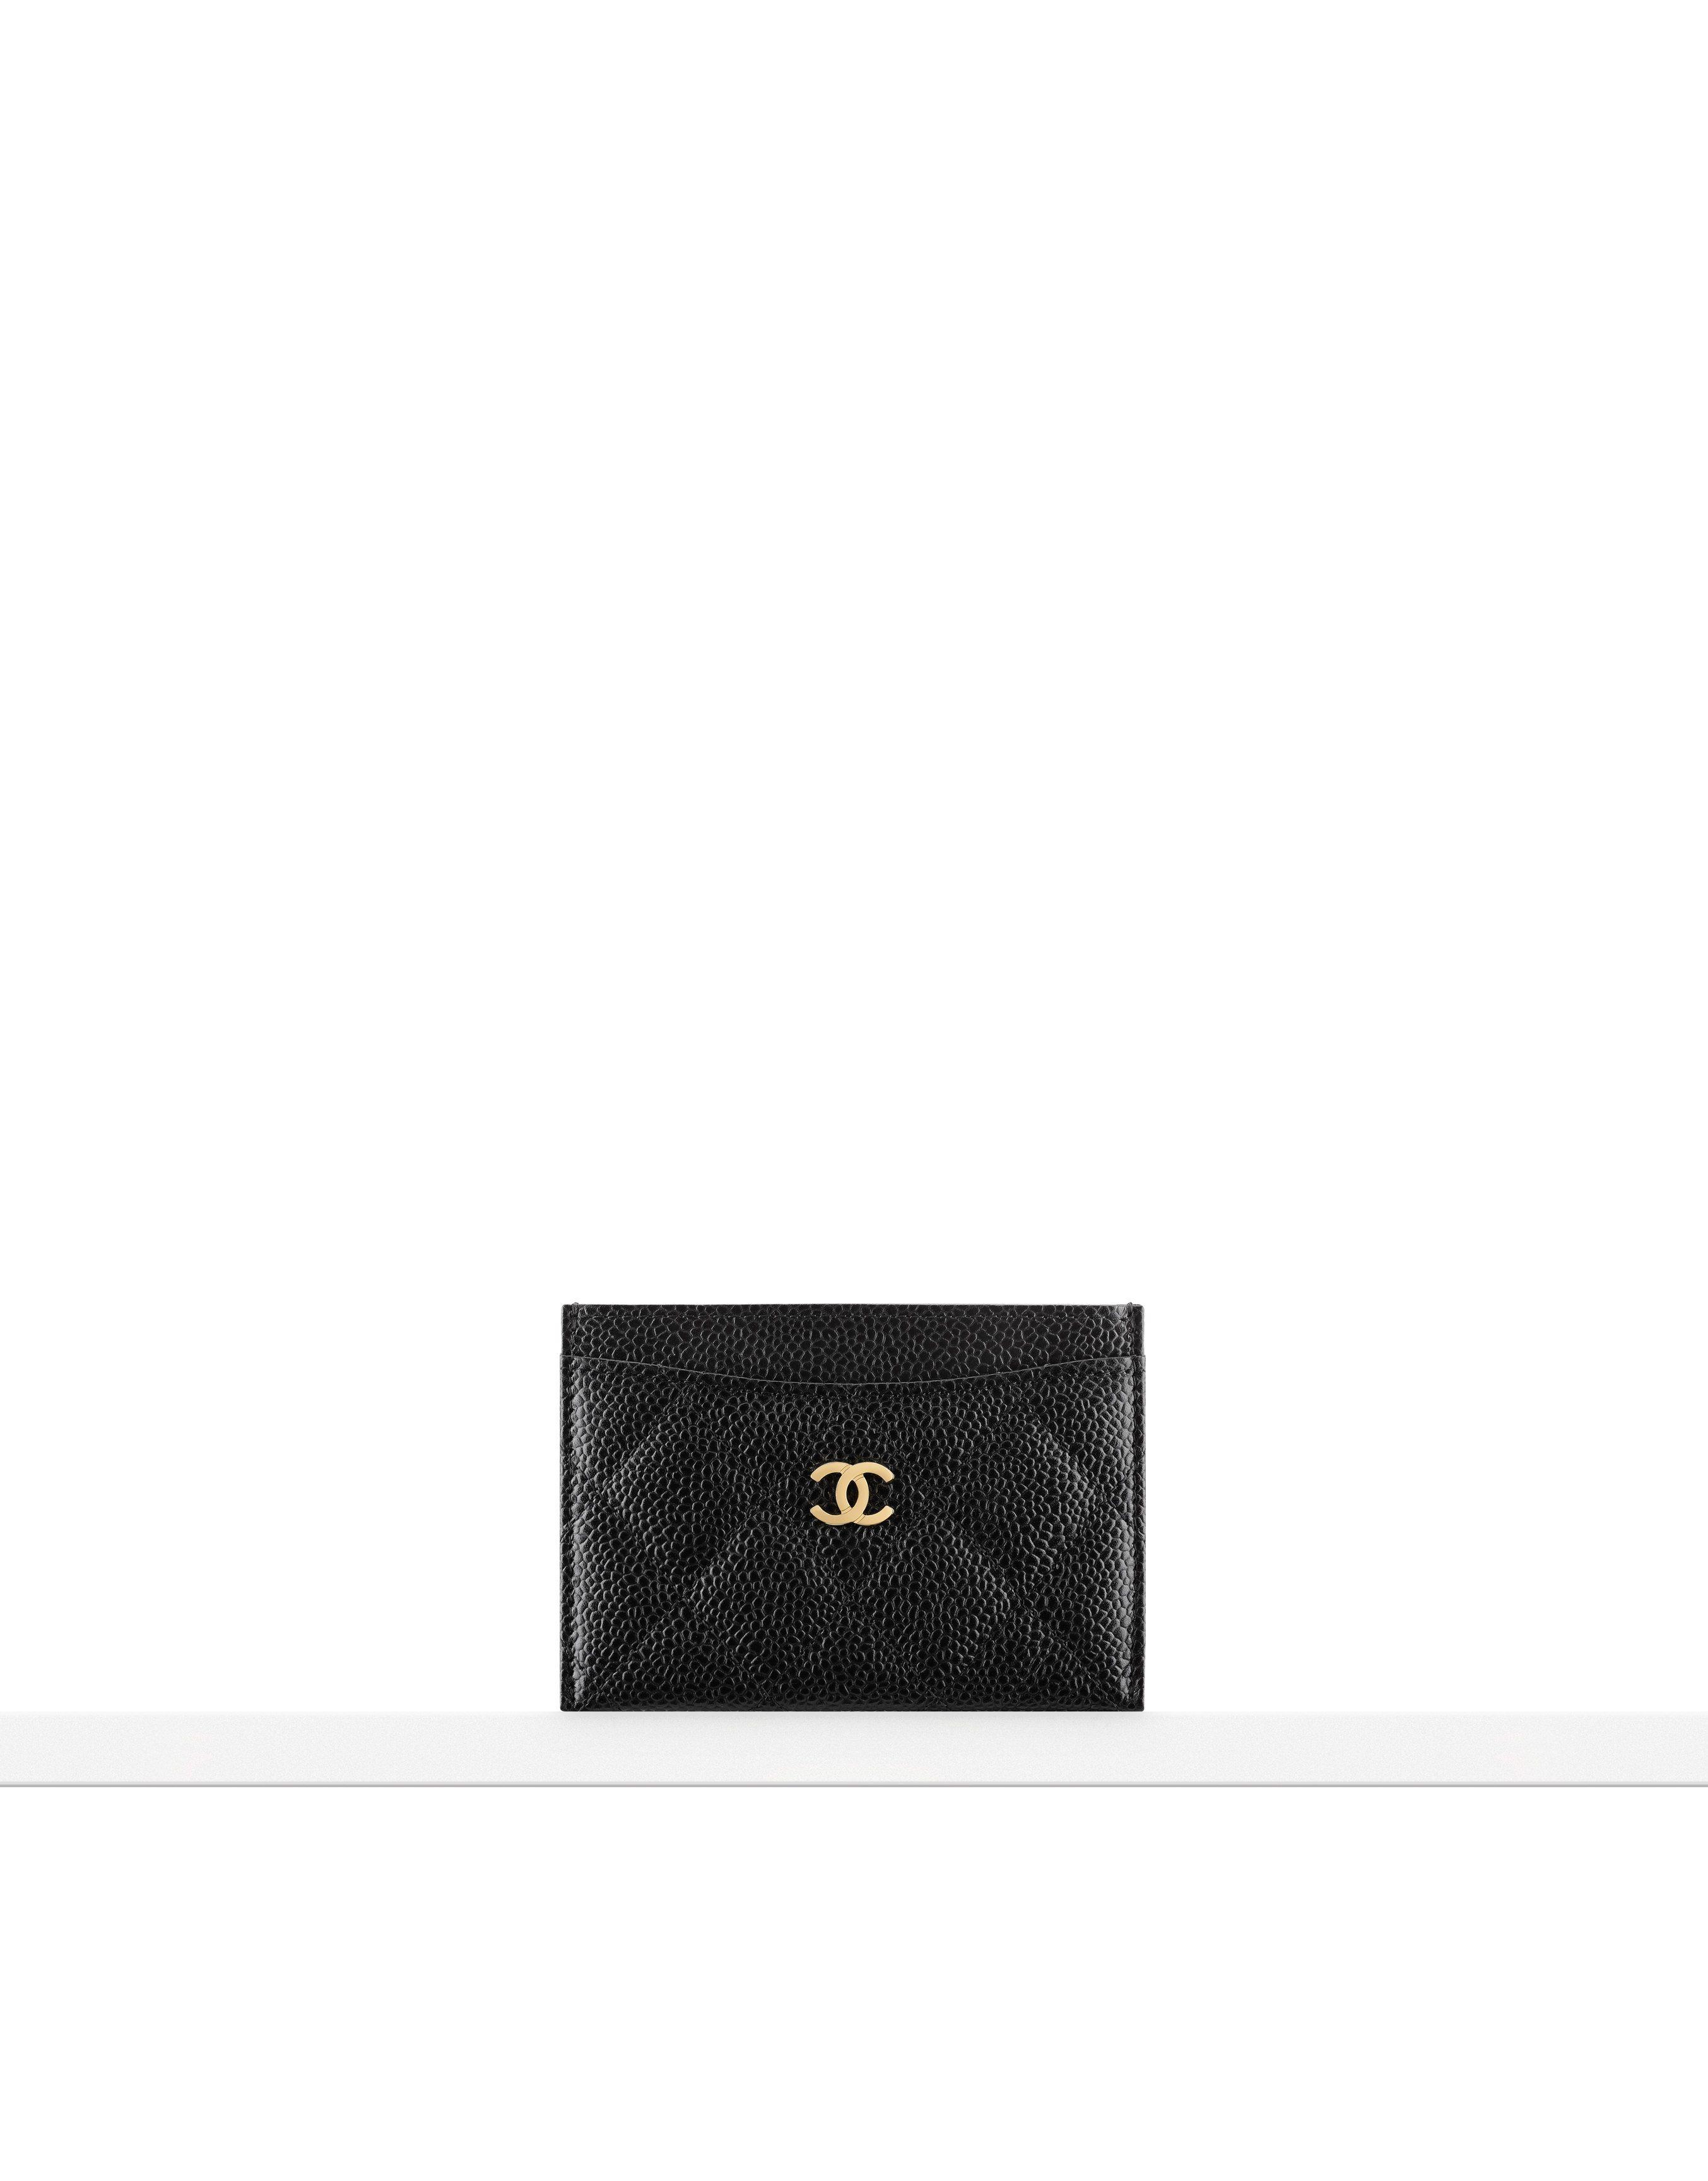 23919c99c571 chanel card holder // grained calfskin & gold metal-black & burgundy ...